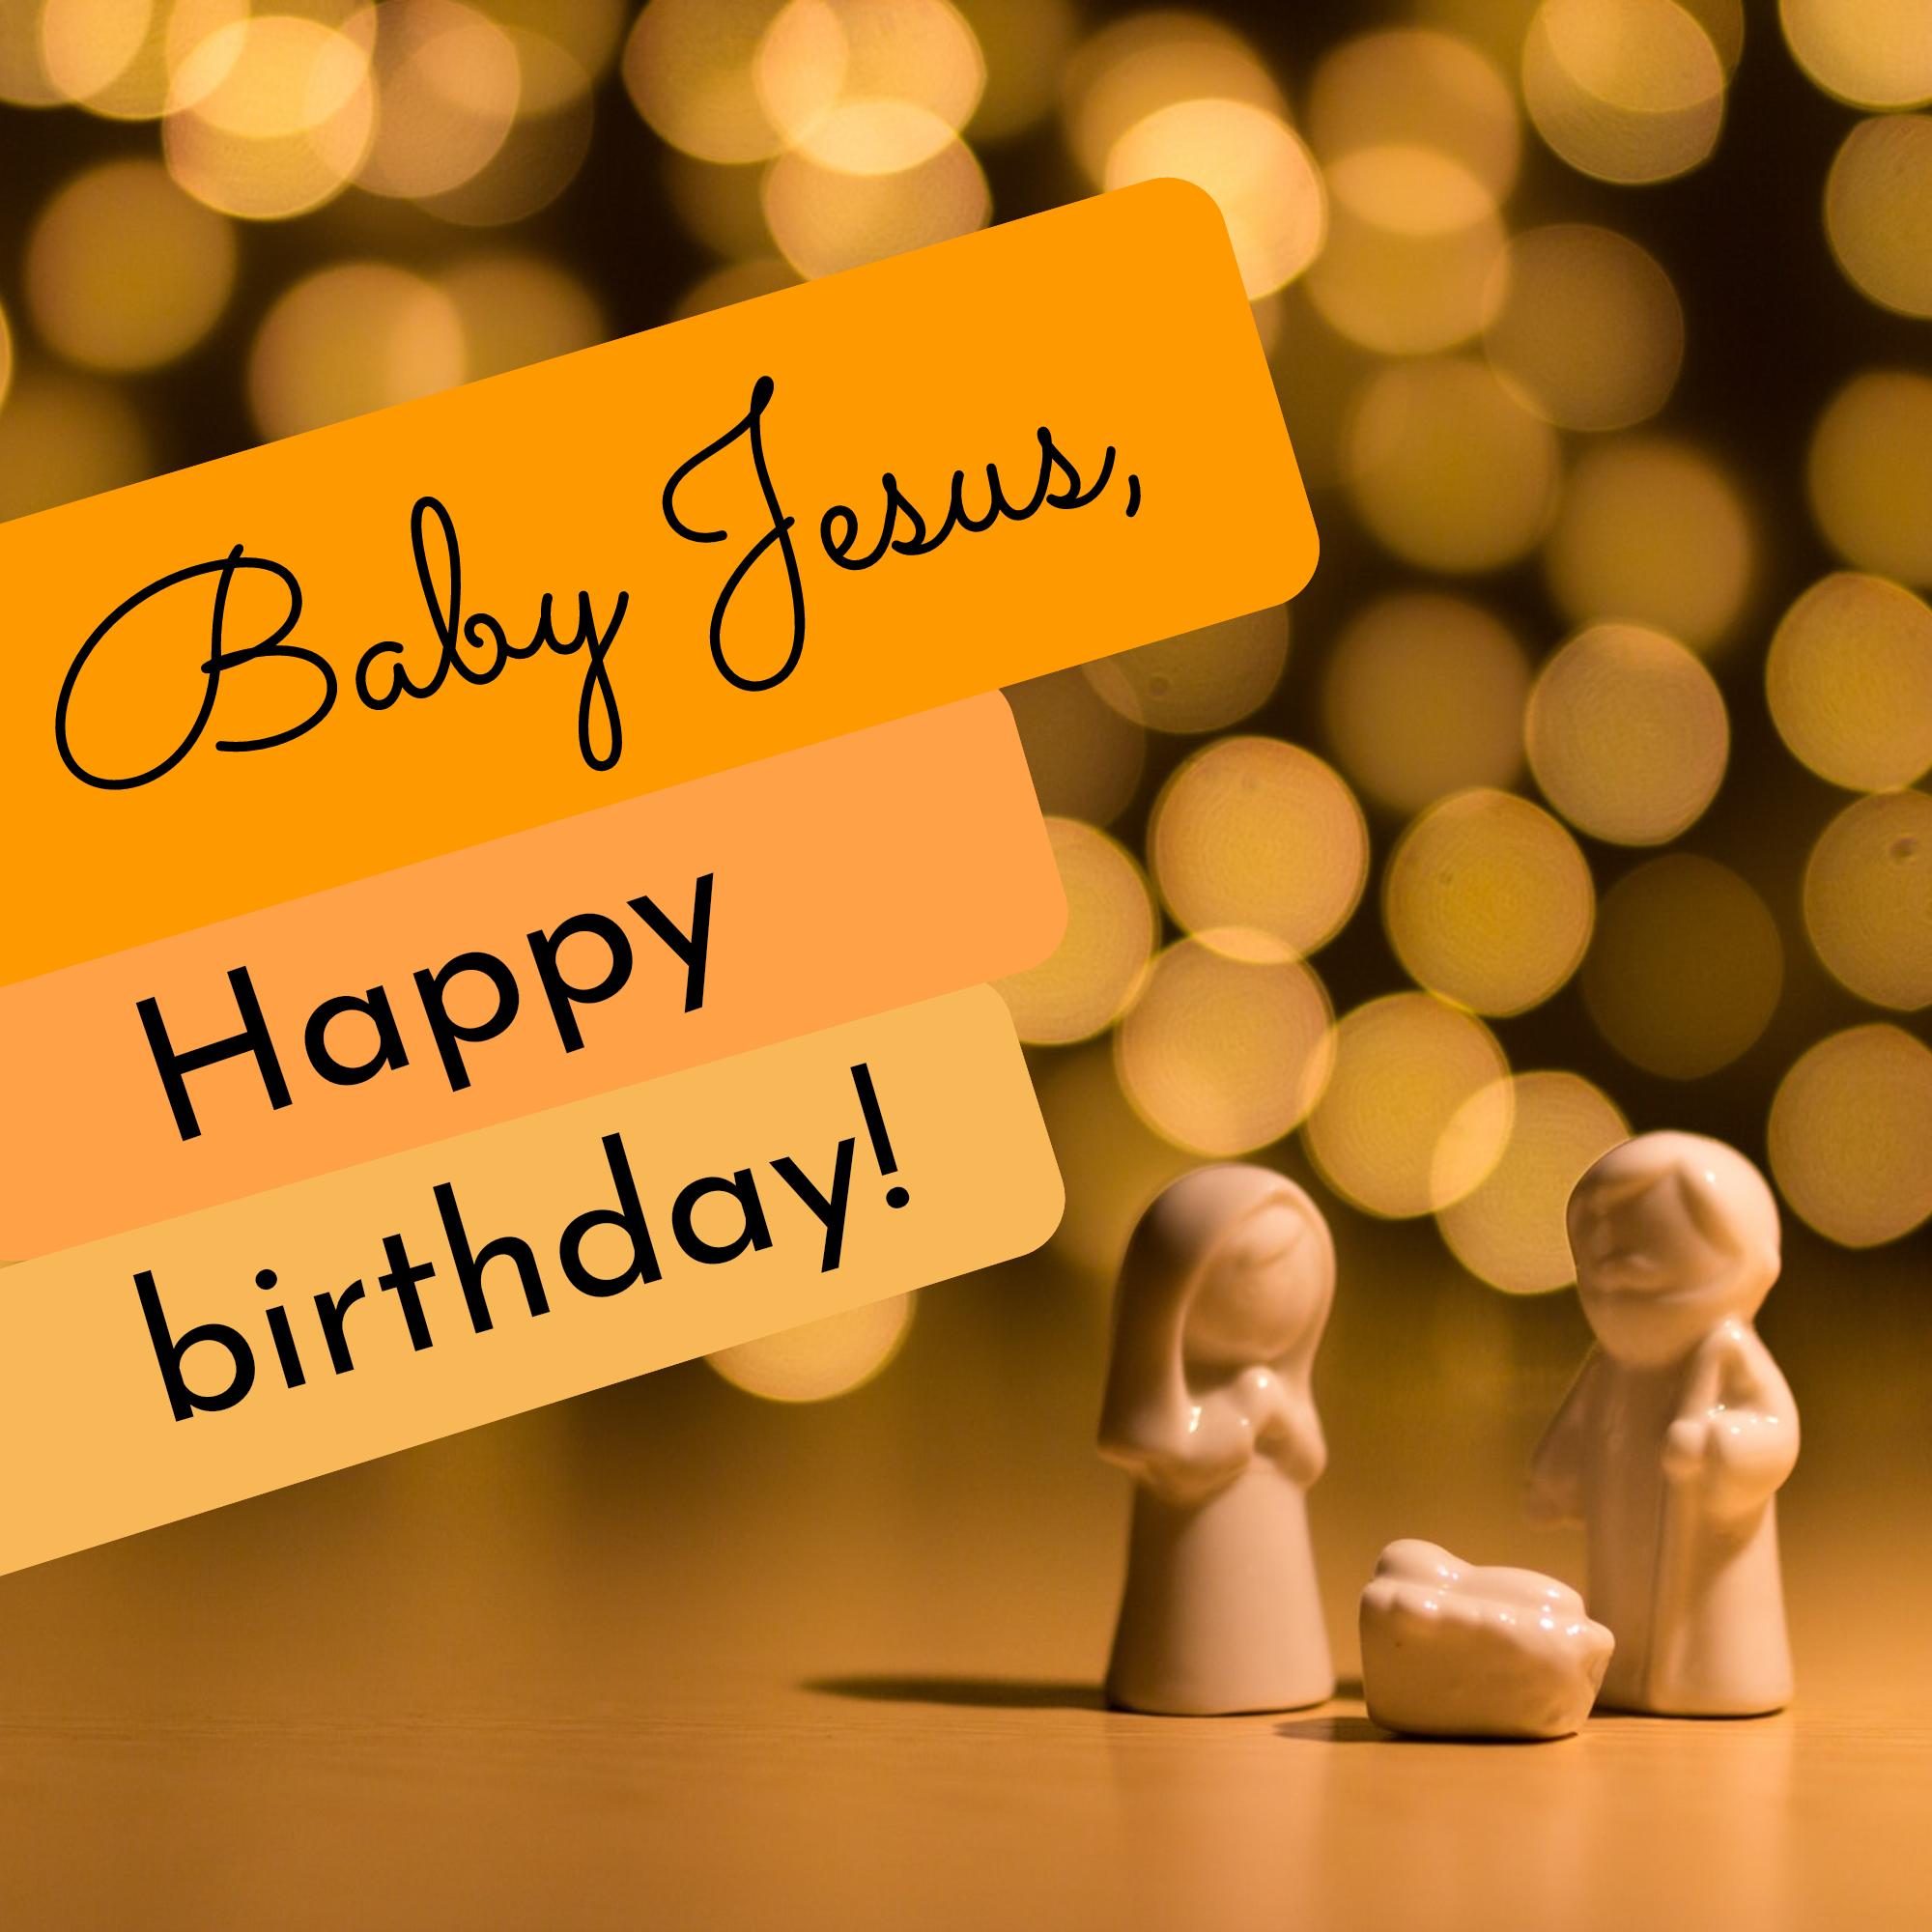 STORY TEMPLATE: Baby Jesus, Happy birthday! Instagram Post